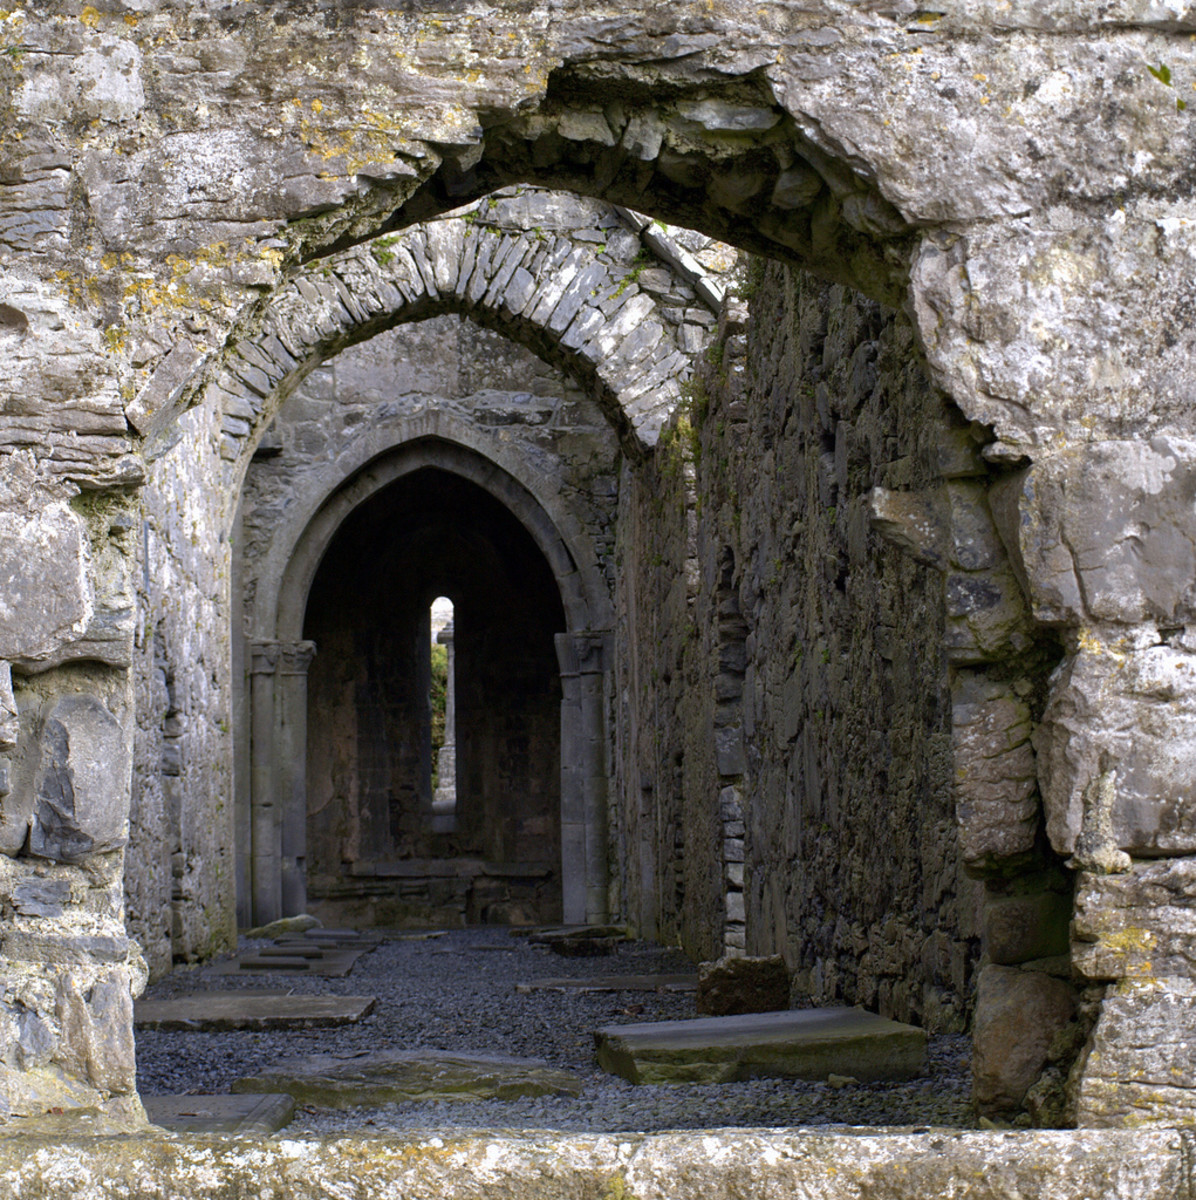 The Burren: Ireland's Unique Bedrock Landscape